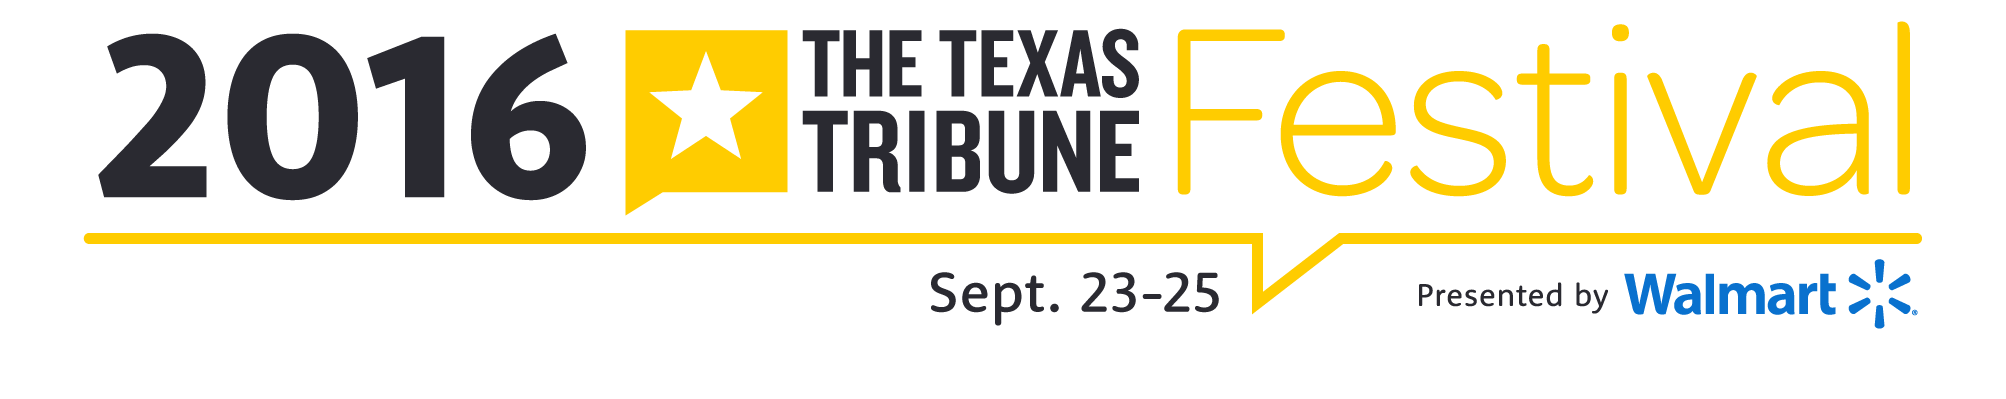 The Texas Tribune Festival logo